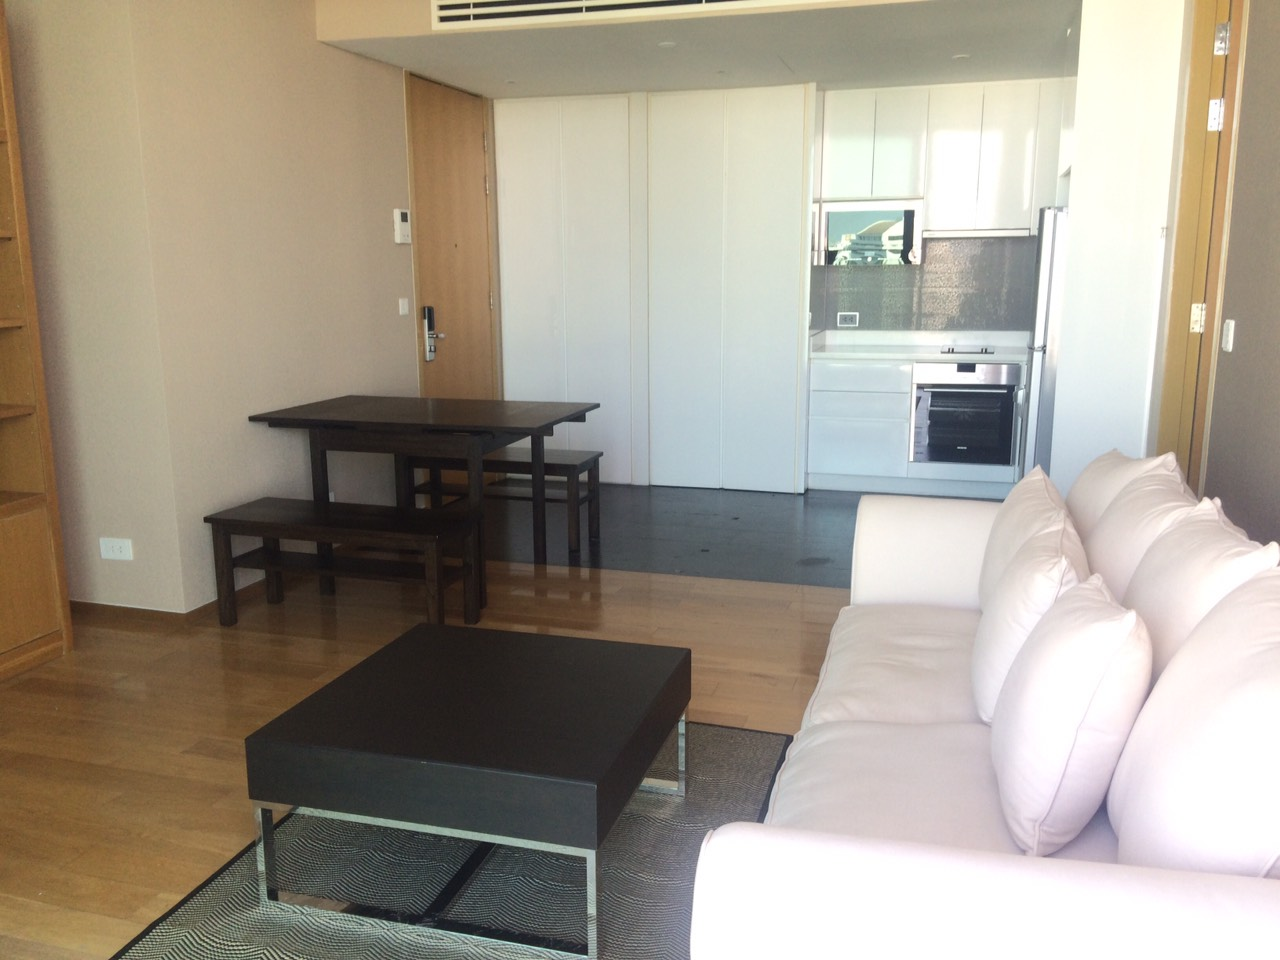 RE/MAX Properties Agency's SALE 1 Bedroom 61 Sq.m at Aequa 12